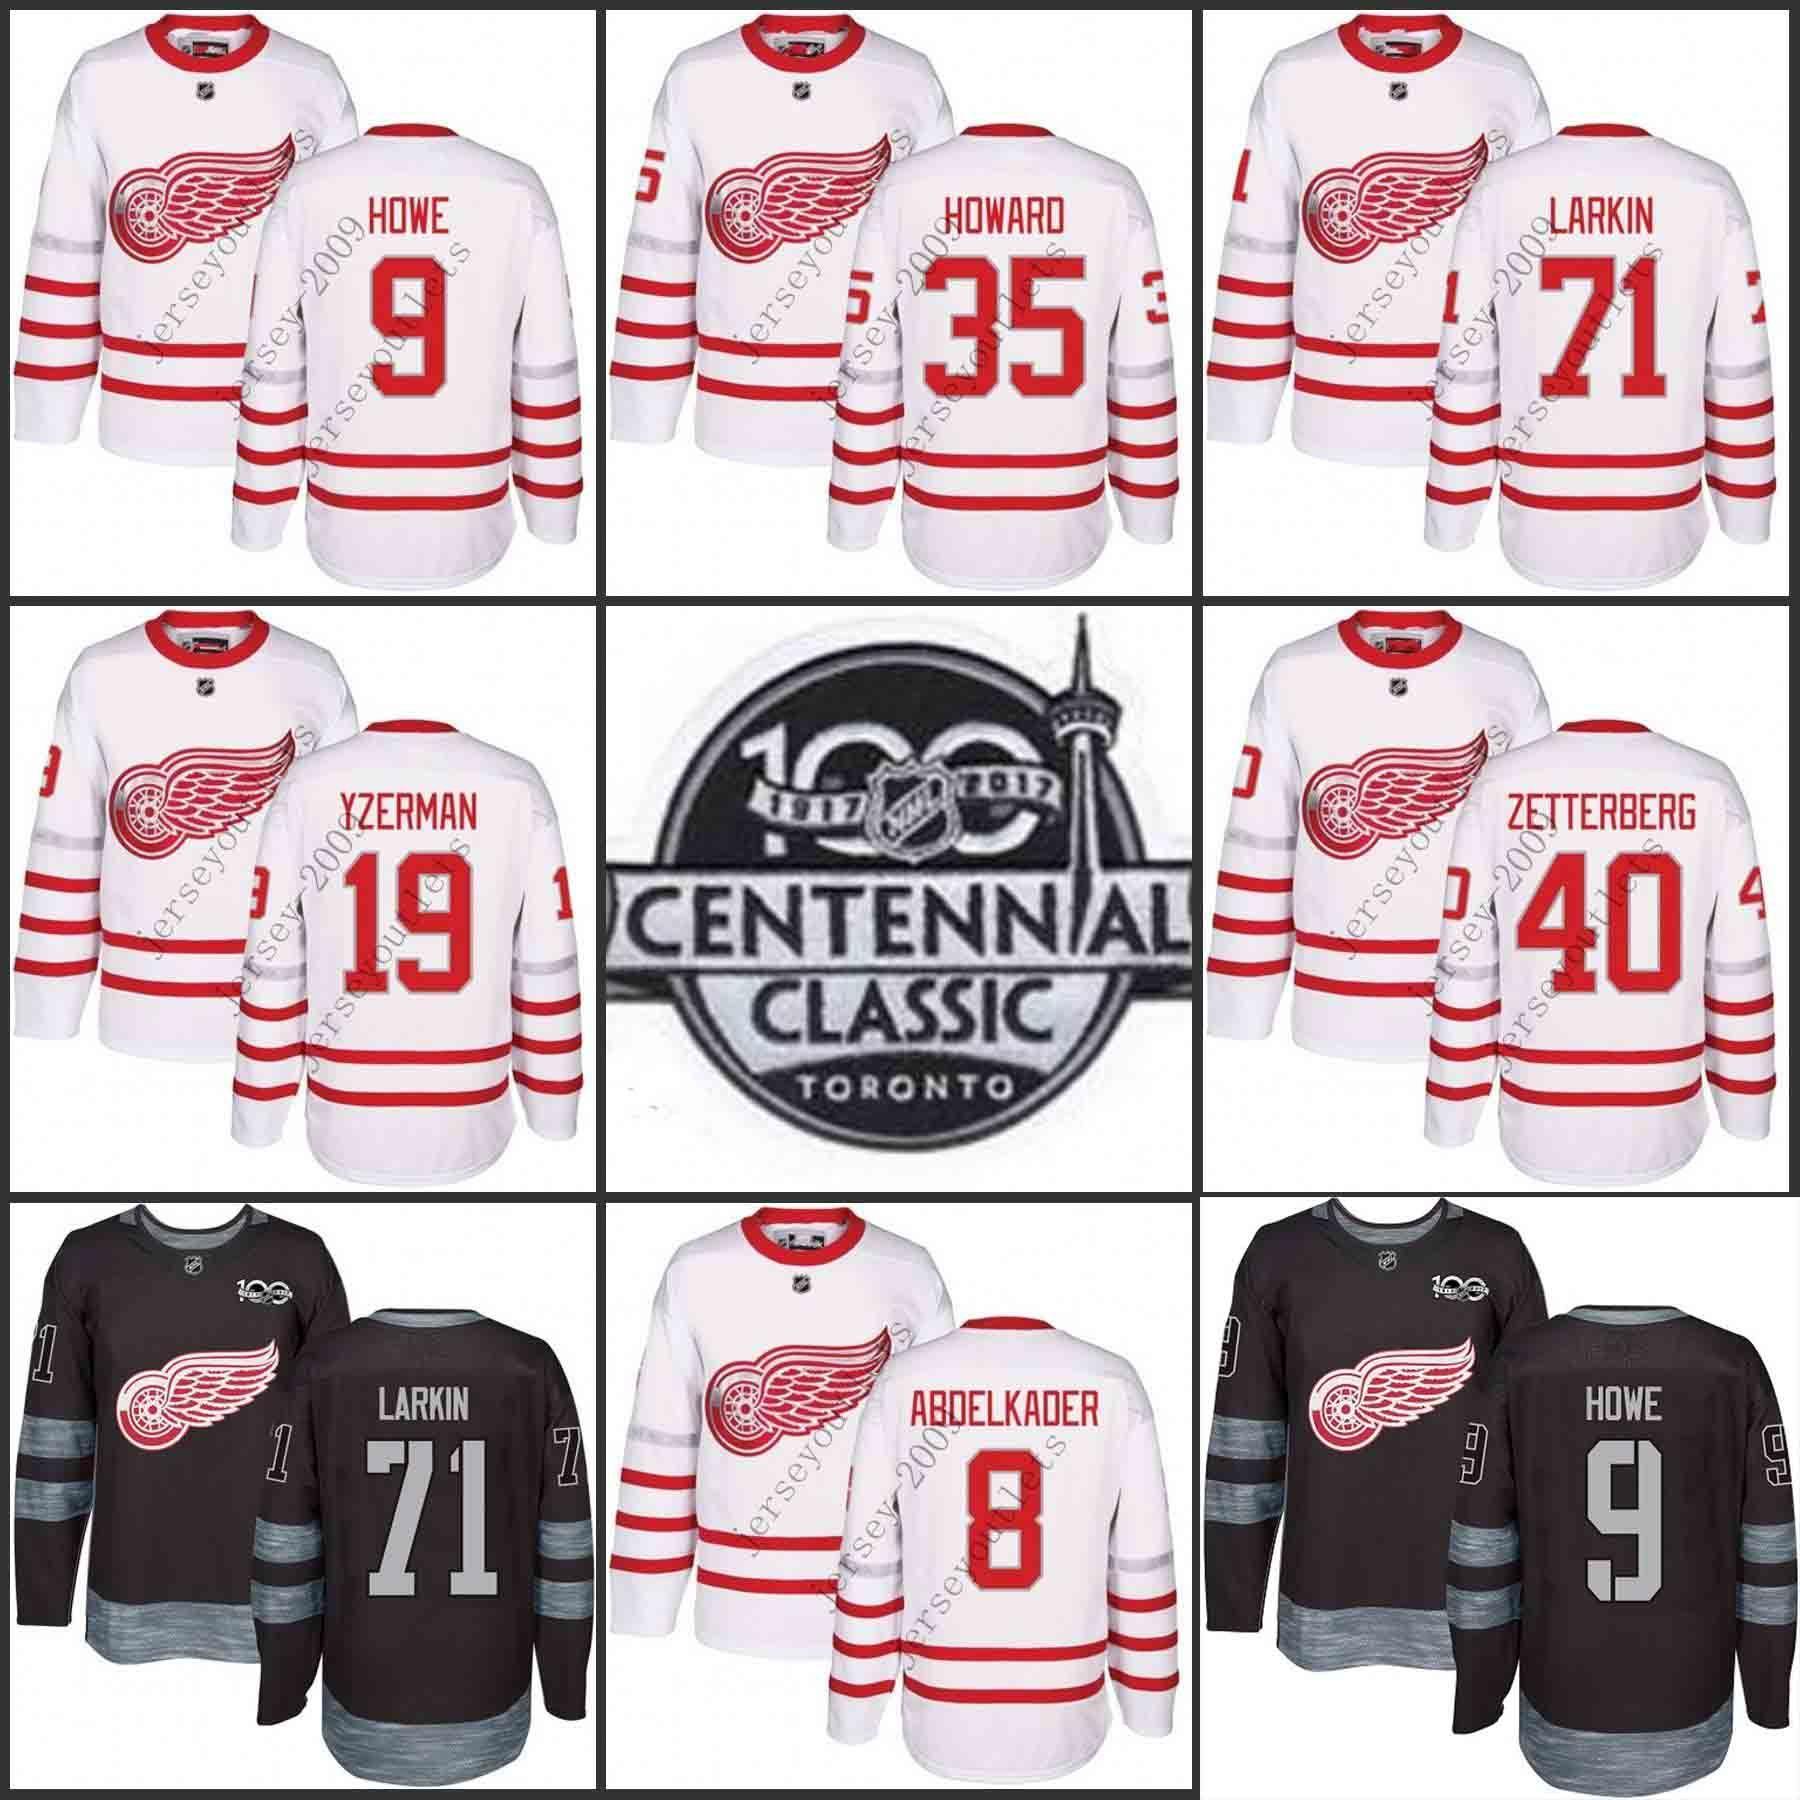 238a847d8 ... shirt f187e 1a542 uk 2019 2017 centennial classic 100th anniversary  detroit red wings 71 dylan larkin 9 gordie howe ...